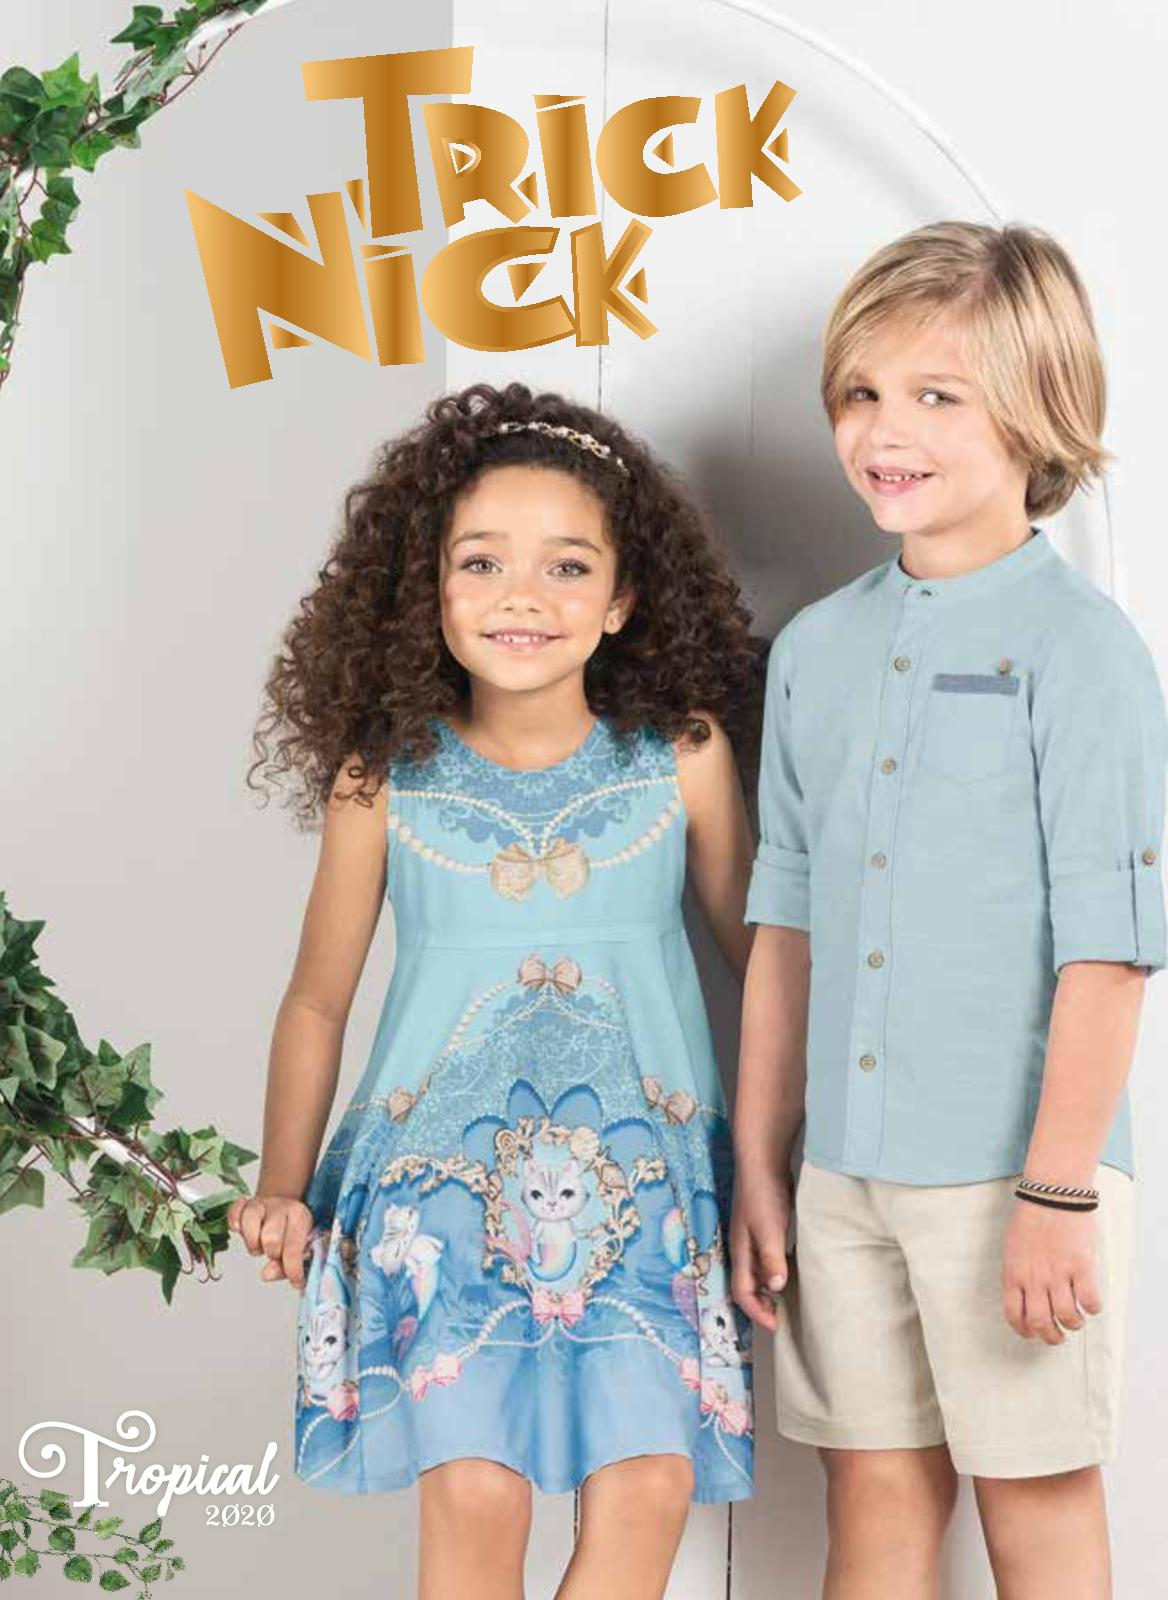 Trick Nick Tropical 20